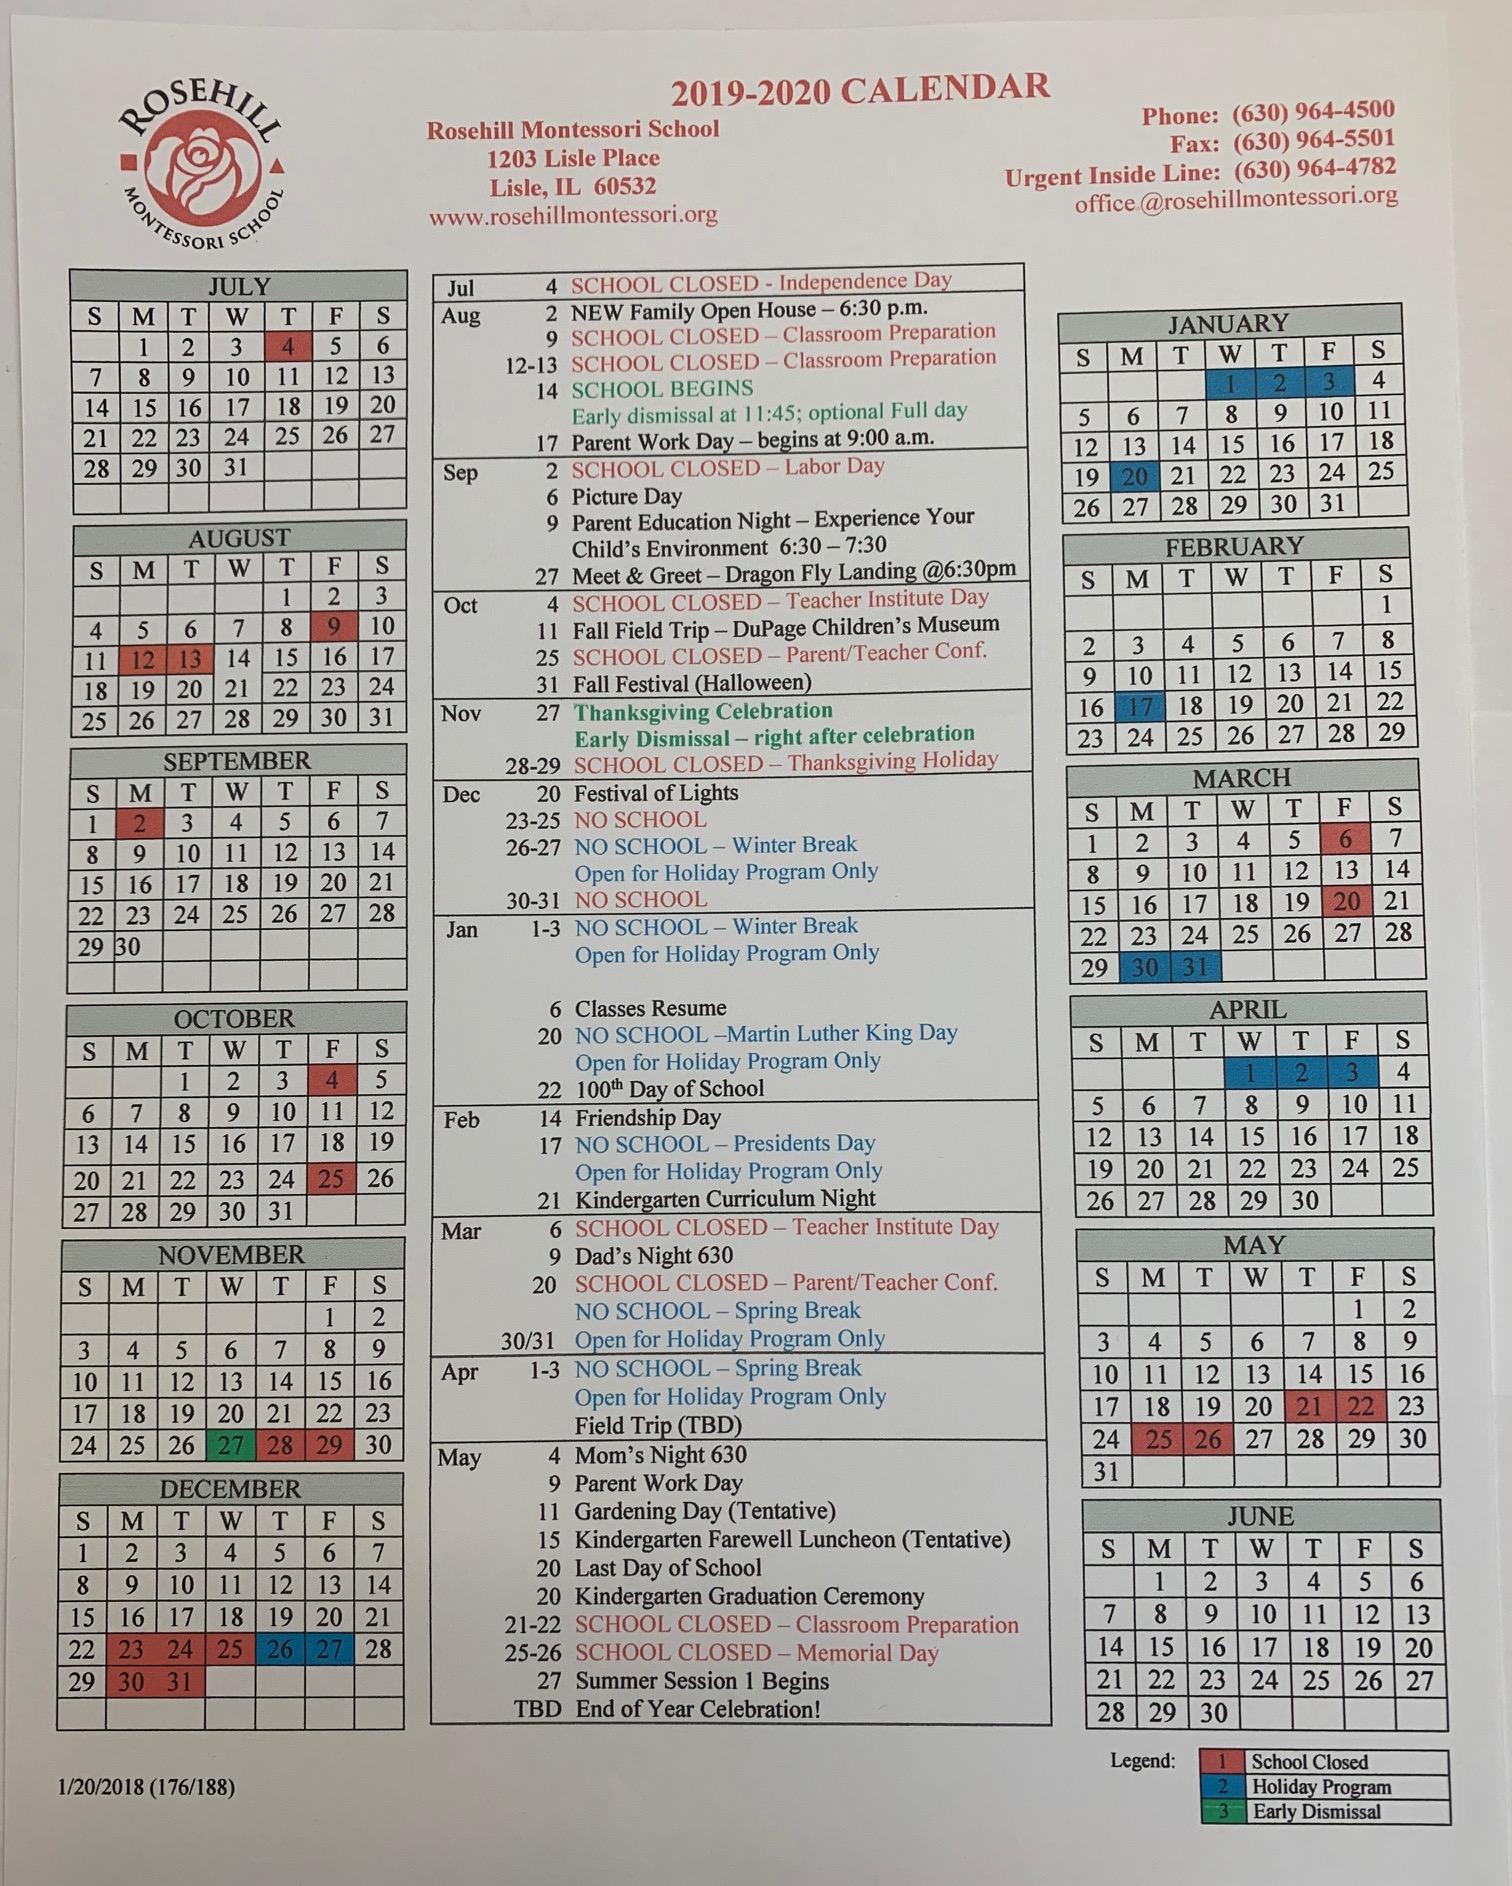 2019 2020 school calendar.jpg